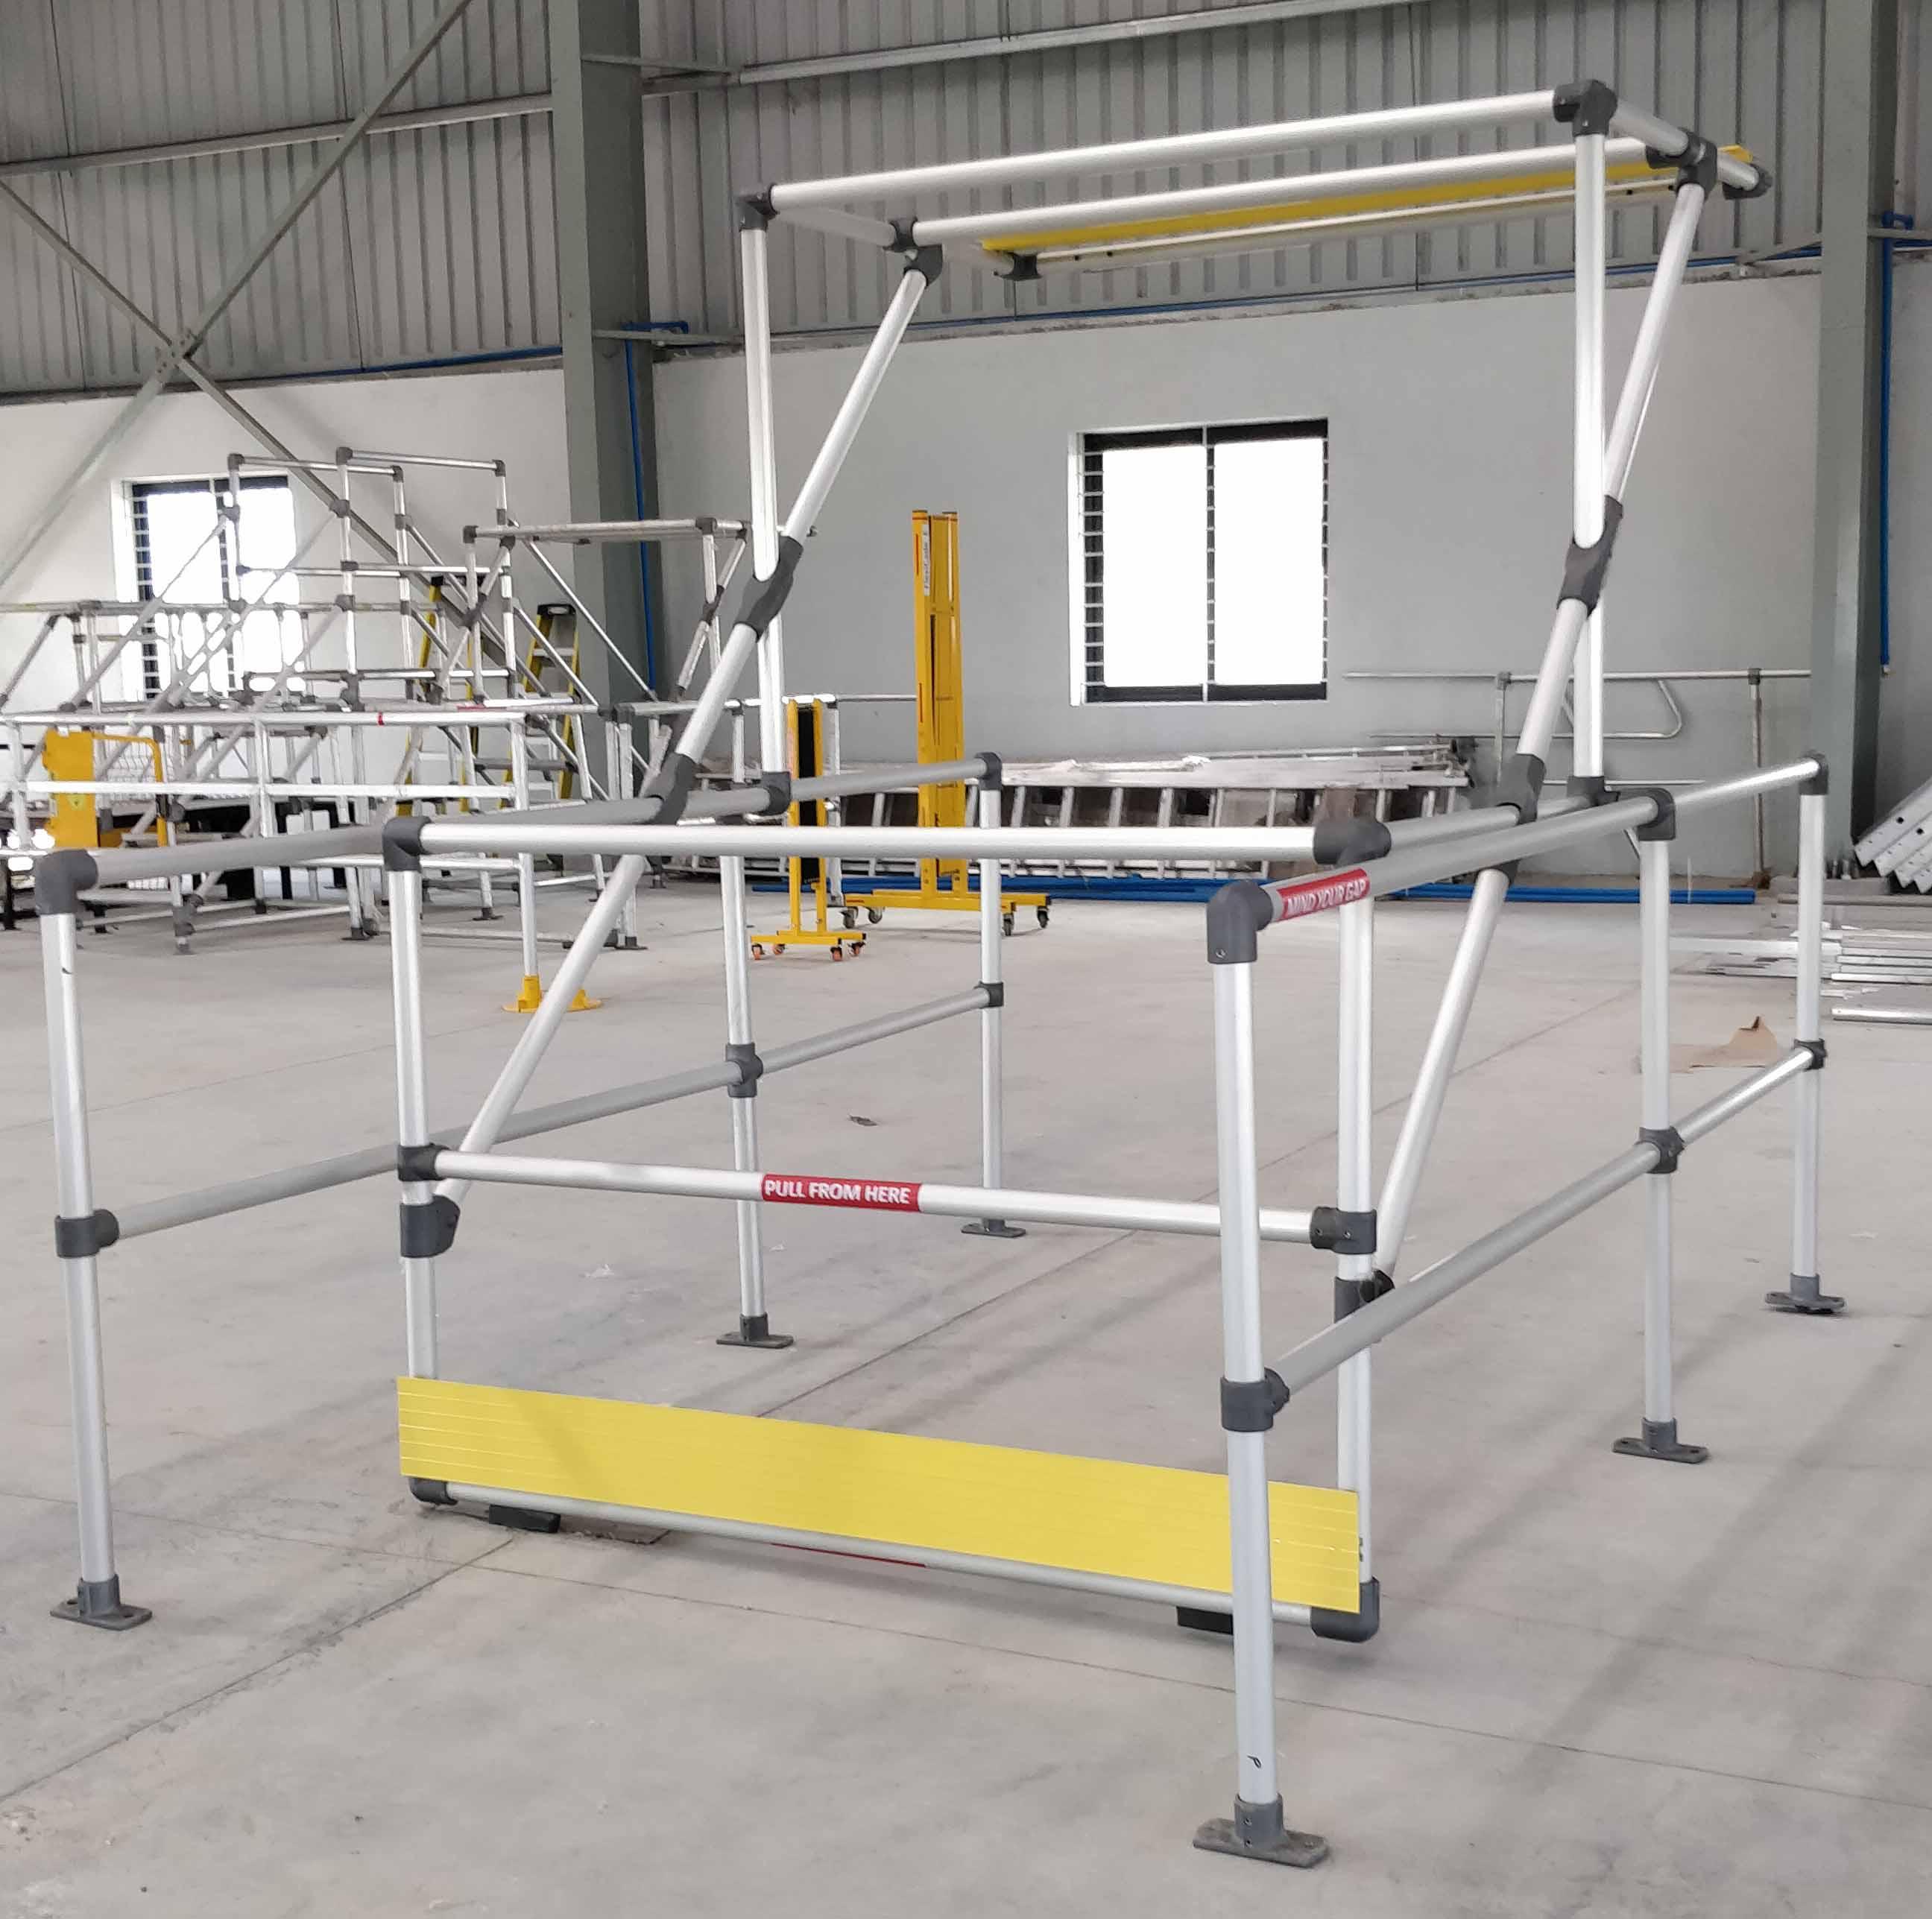 Endurail structural aluminum